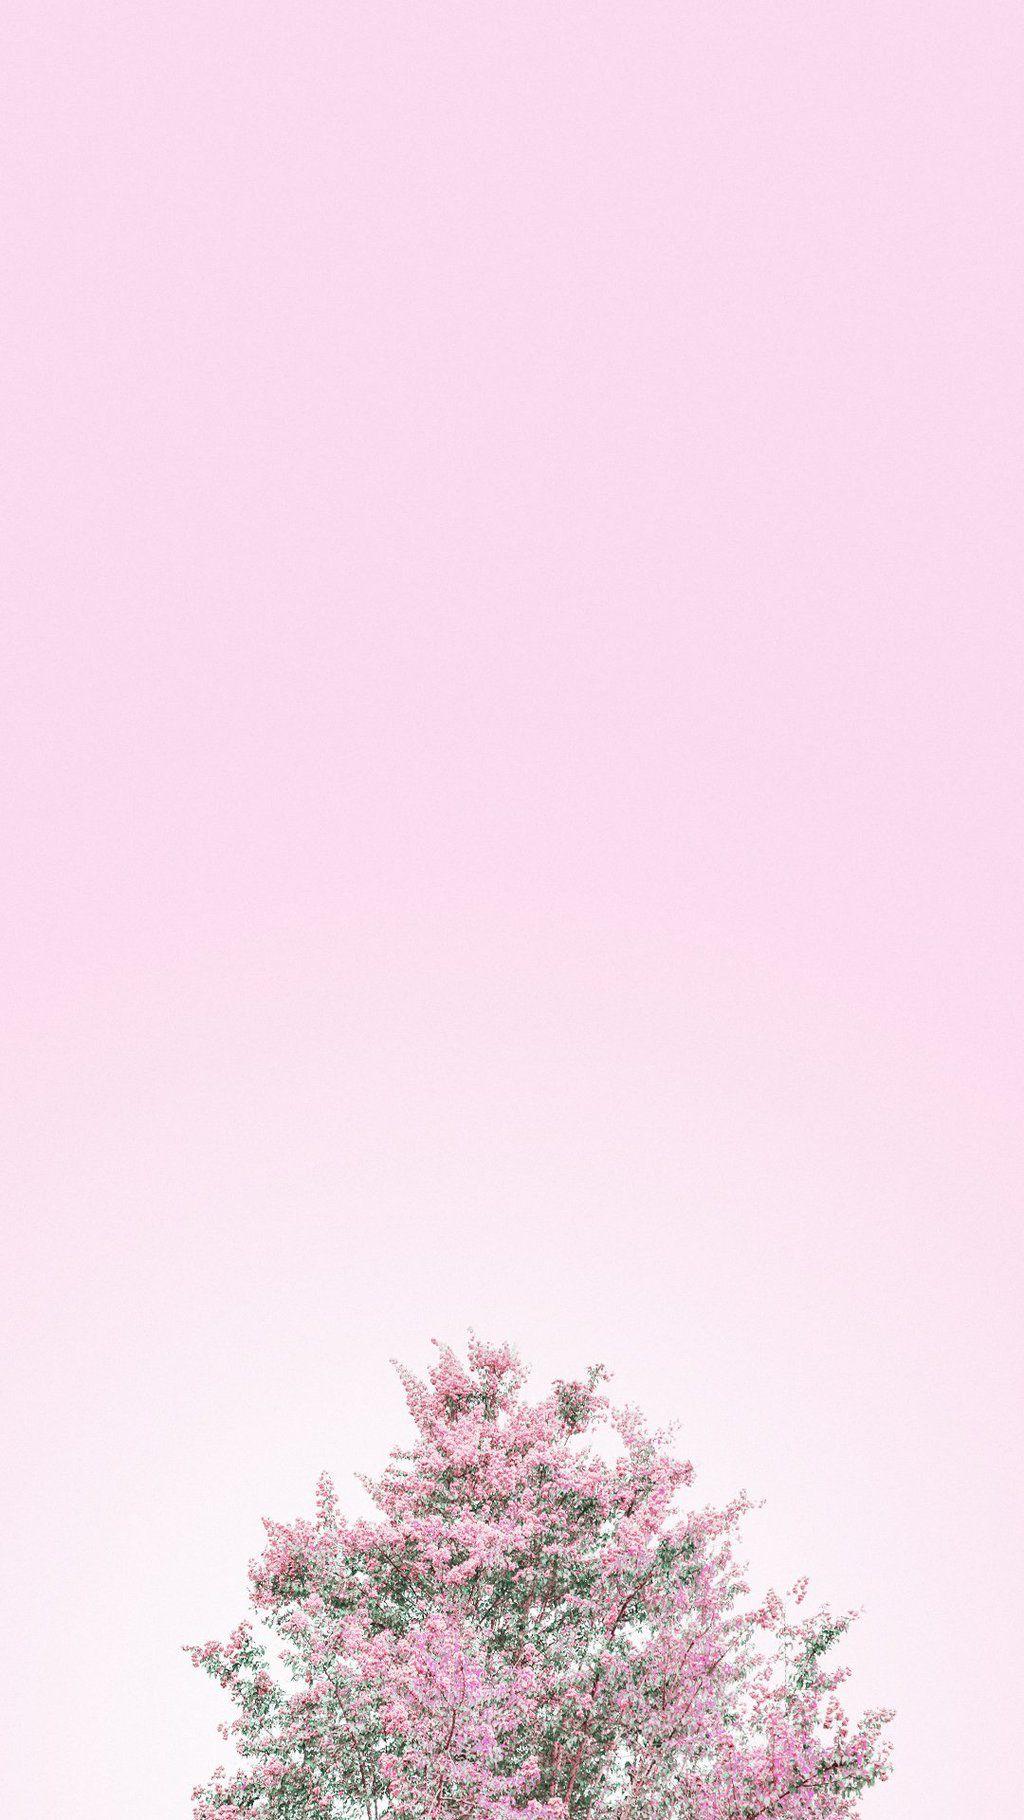 Aesthetic Minimalist Wallpaper Pink